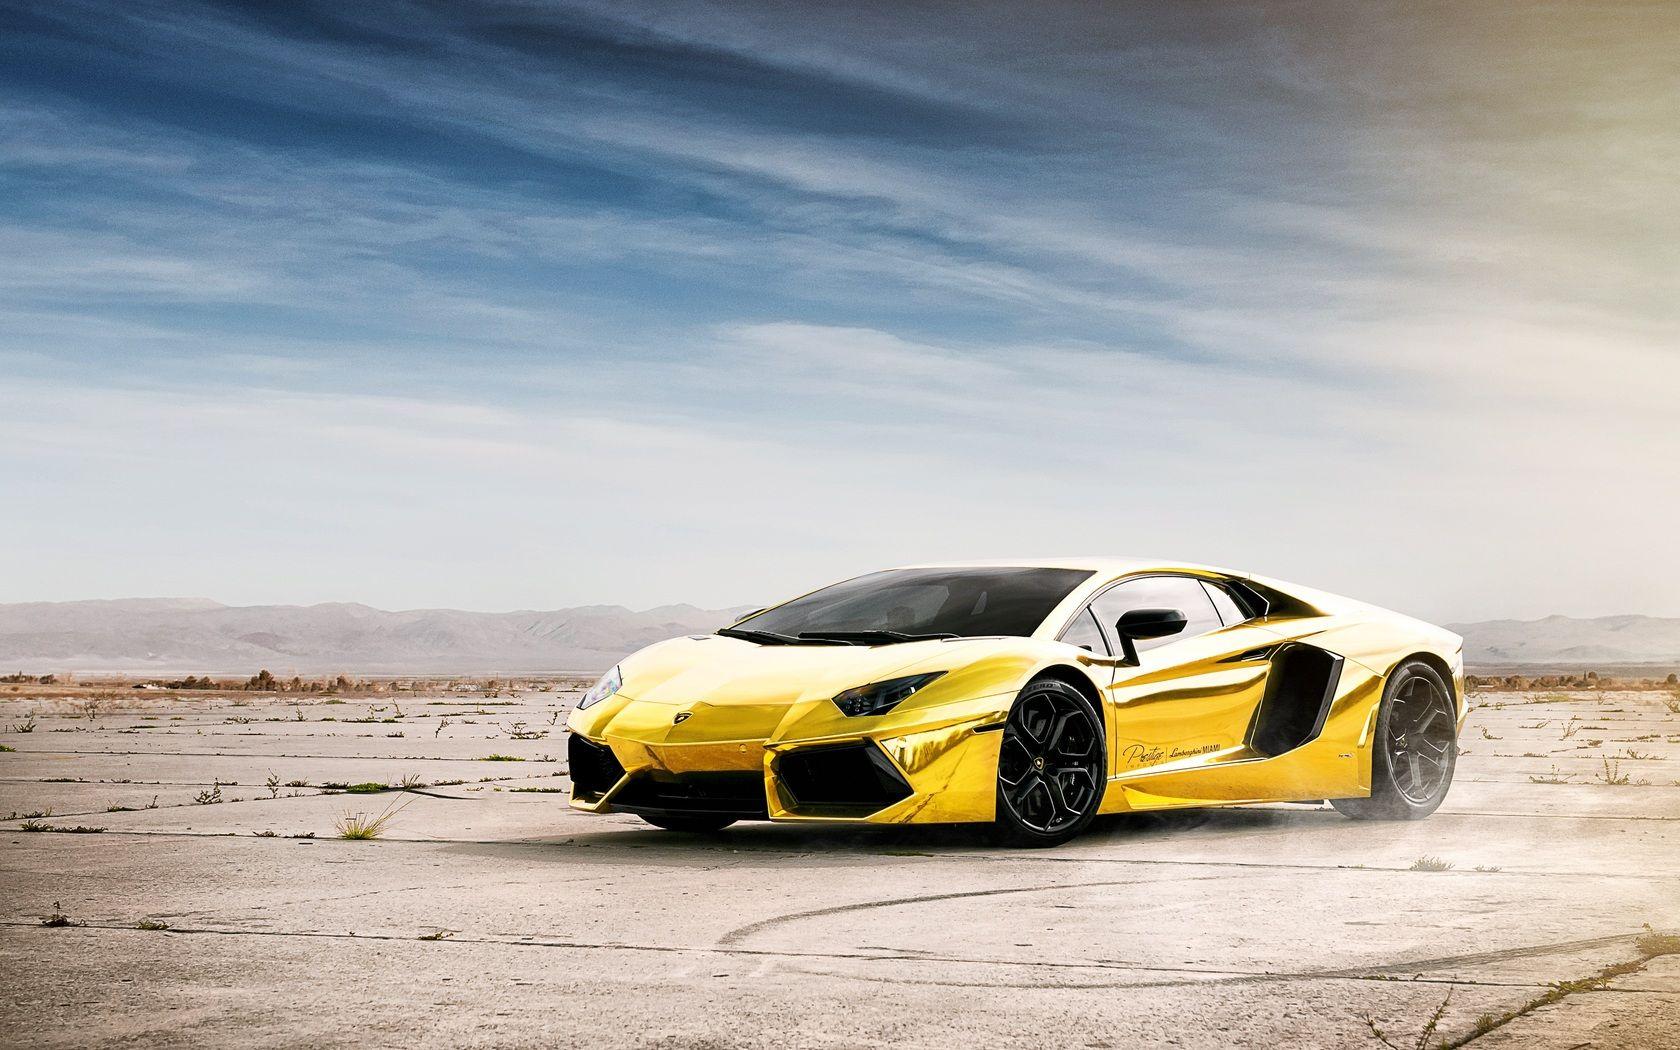 World No1 Luxury Car Lamborghini Aventador Gold Hd Wallpaper